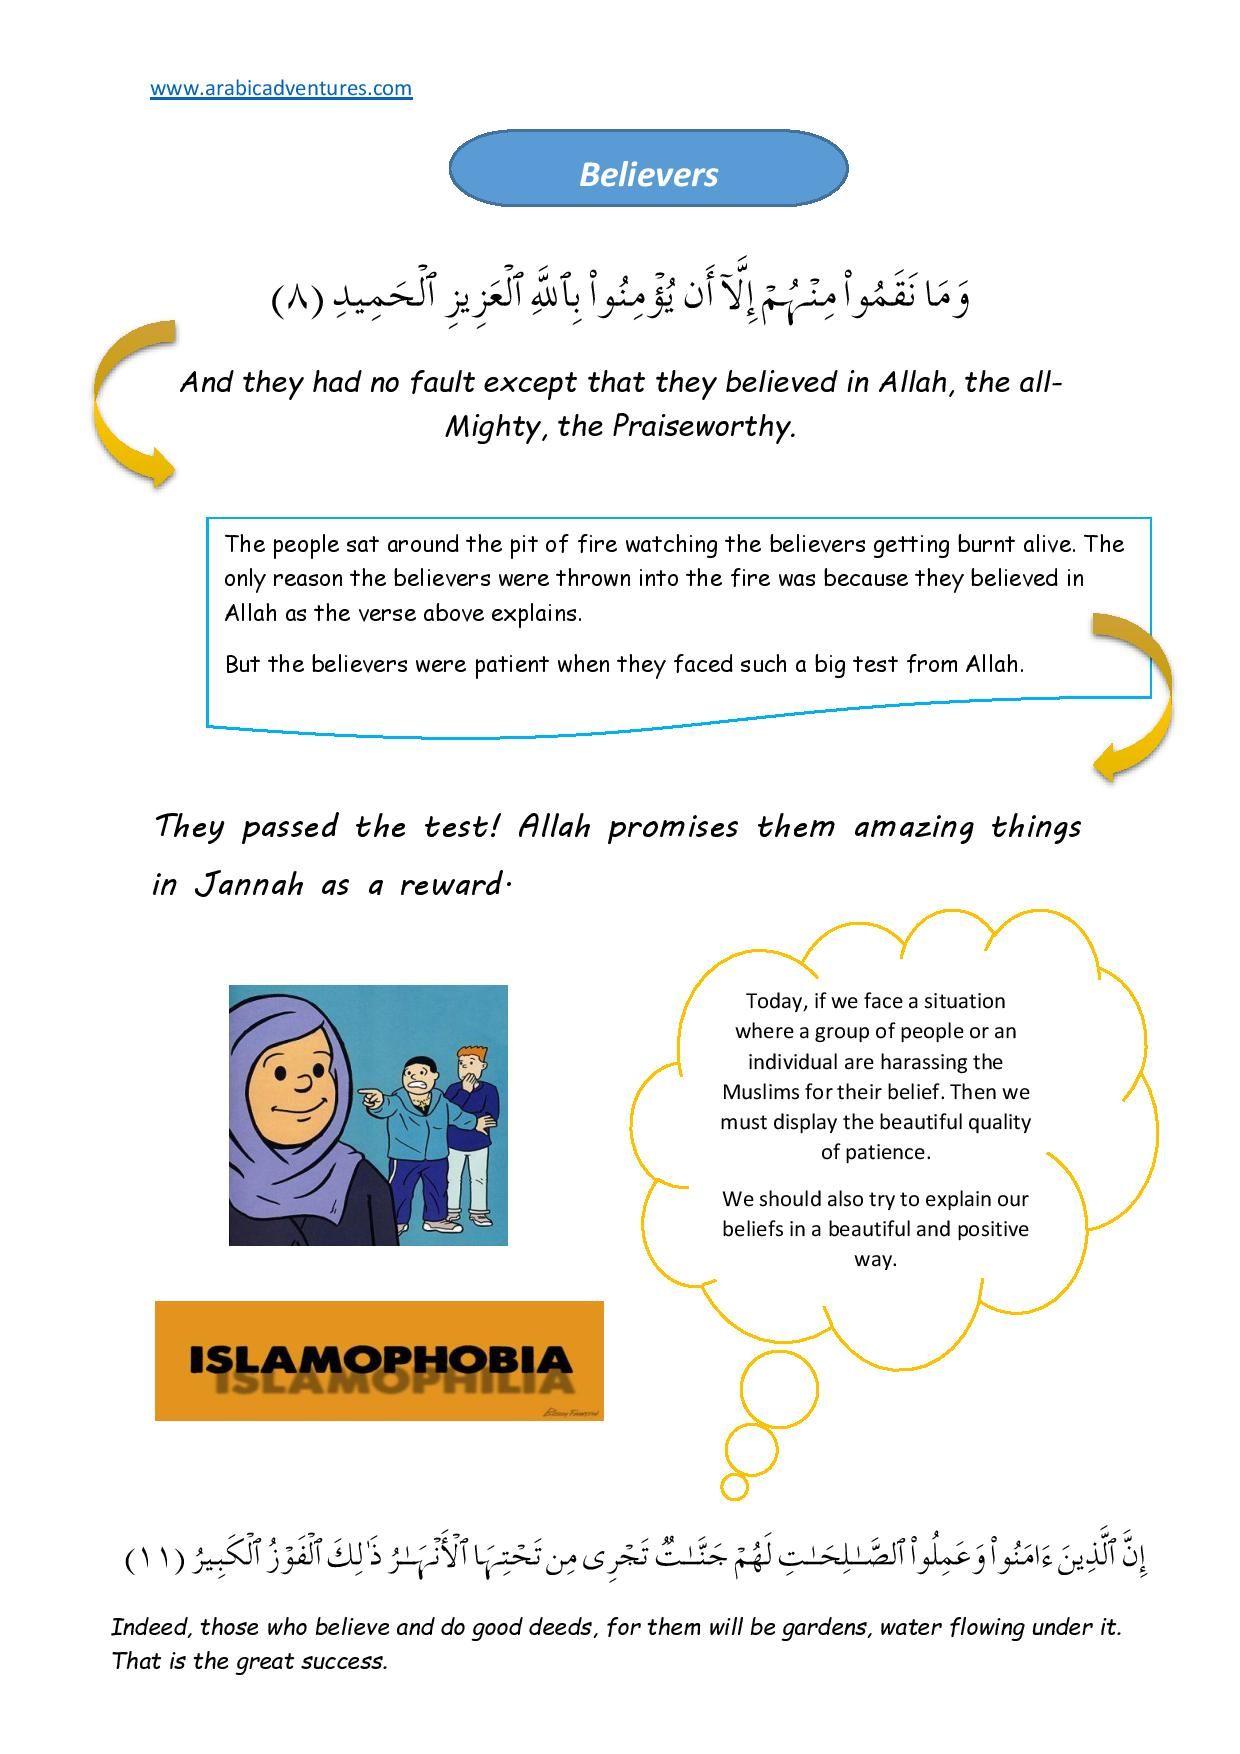 Surah al-Burooj hand out 2 free pdf at www arabicadventures